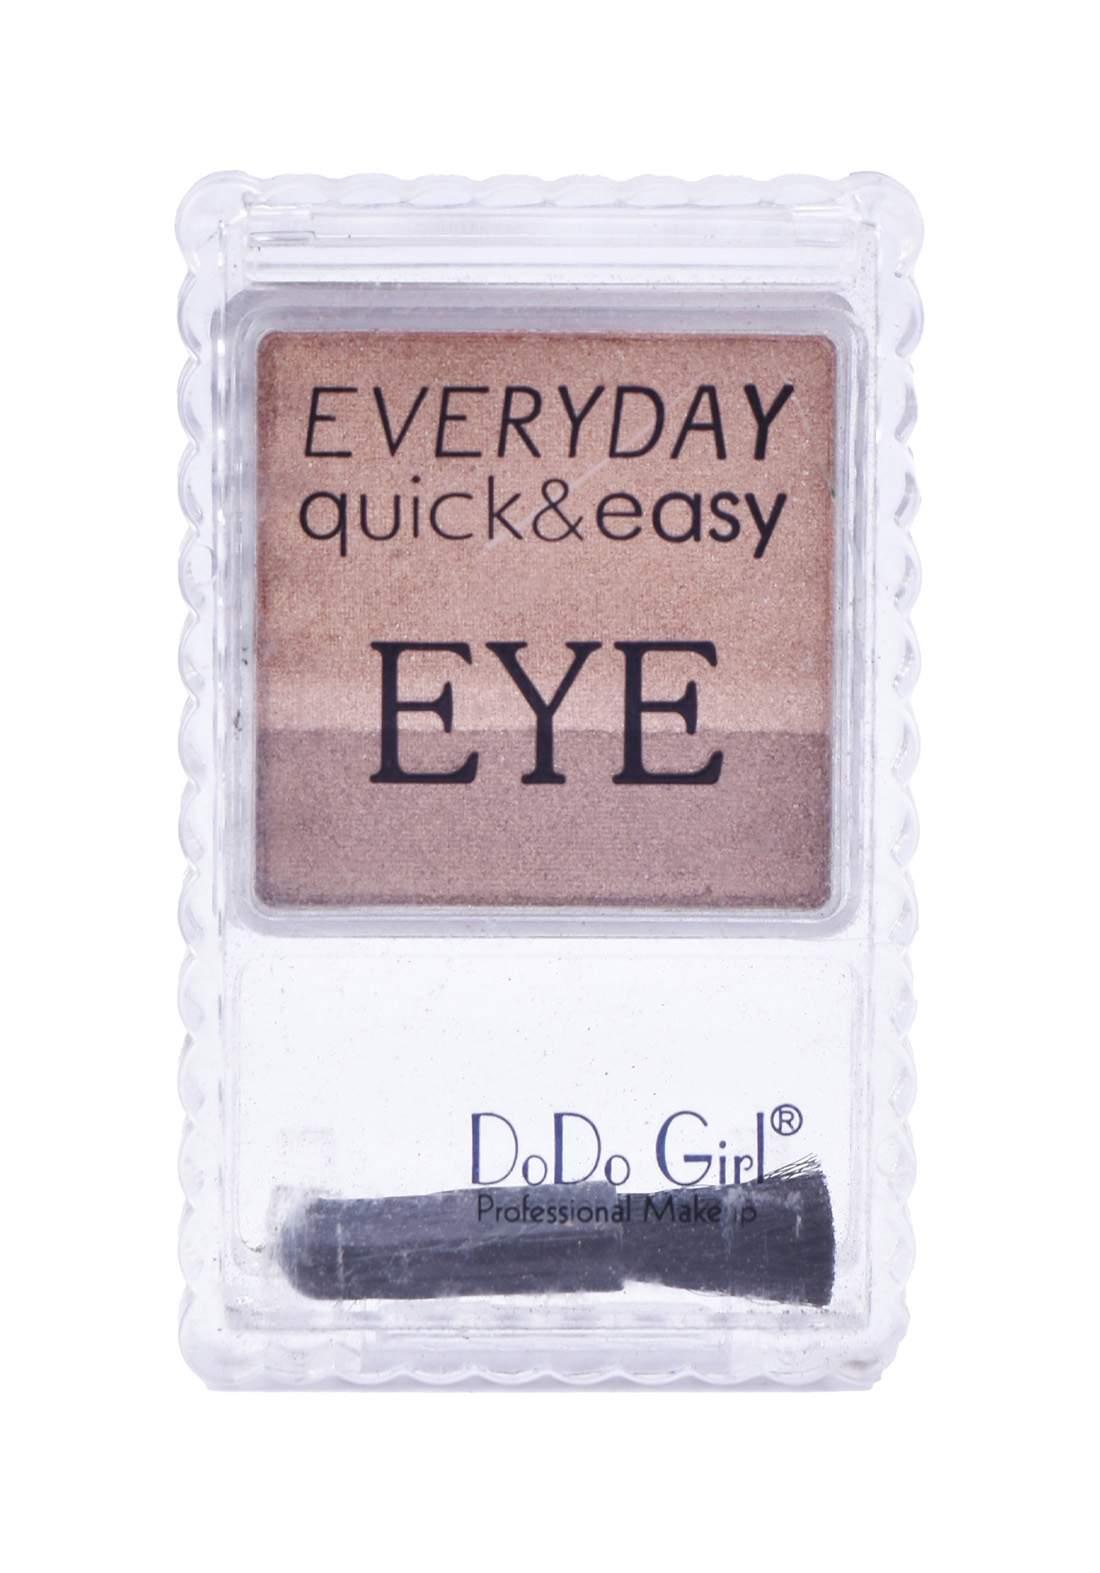 Dodo Girl Every Day Quick & Easy Eye Shadow No.1 ظلال للعين